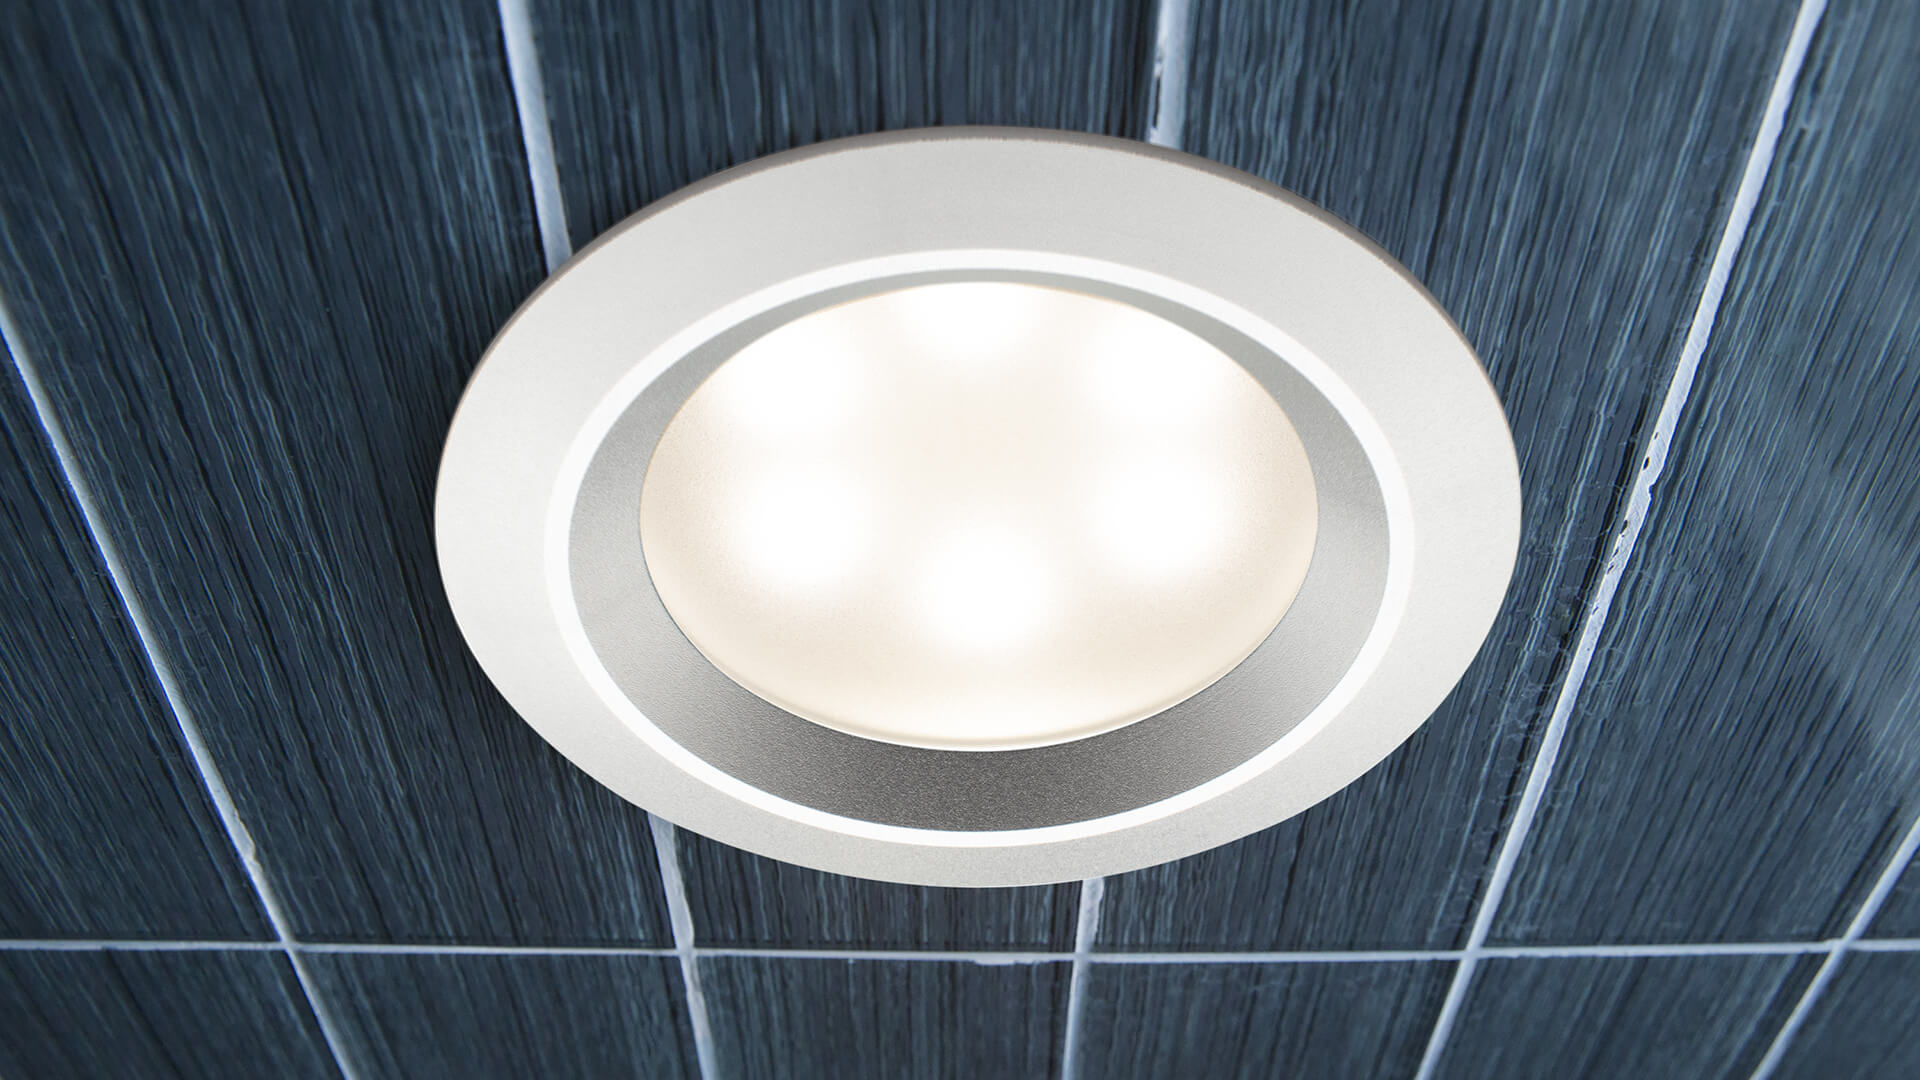 Recessed Led Light Heat And Moisture Resistant Mrsteam